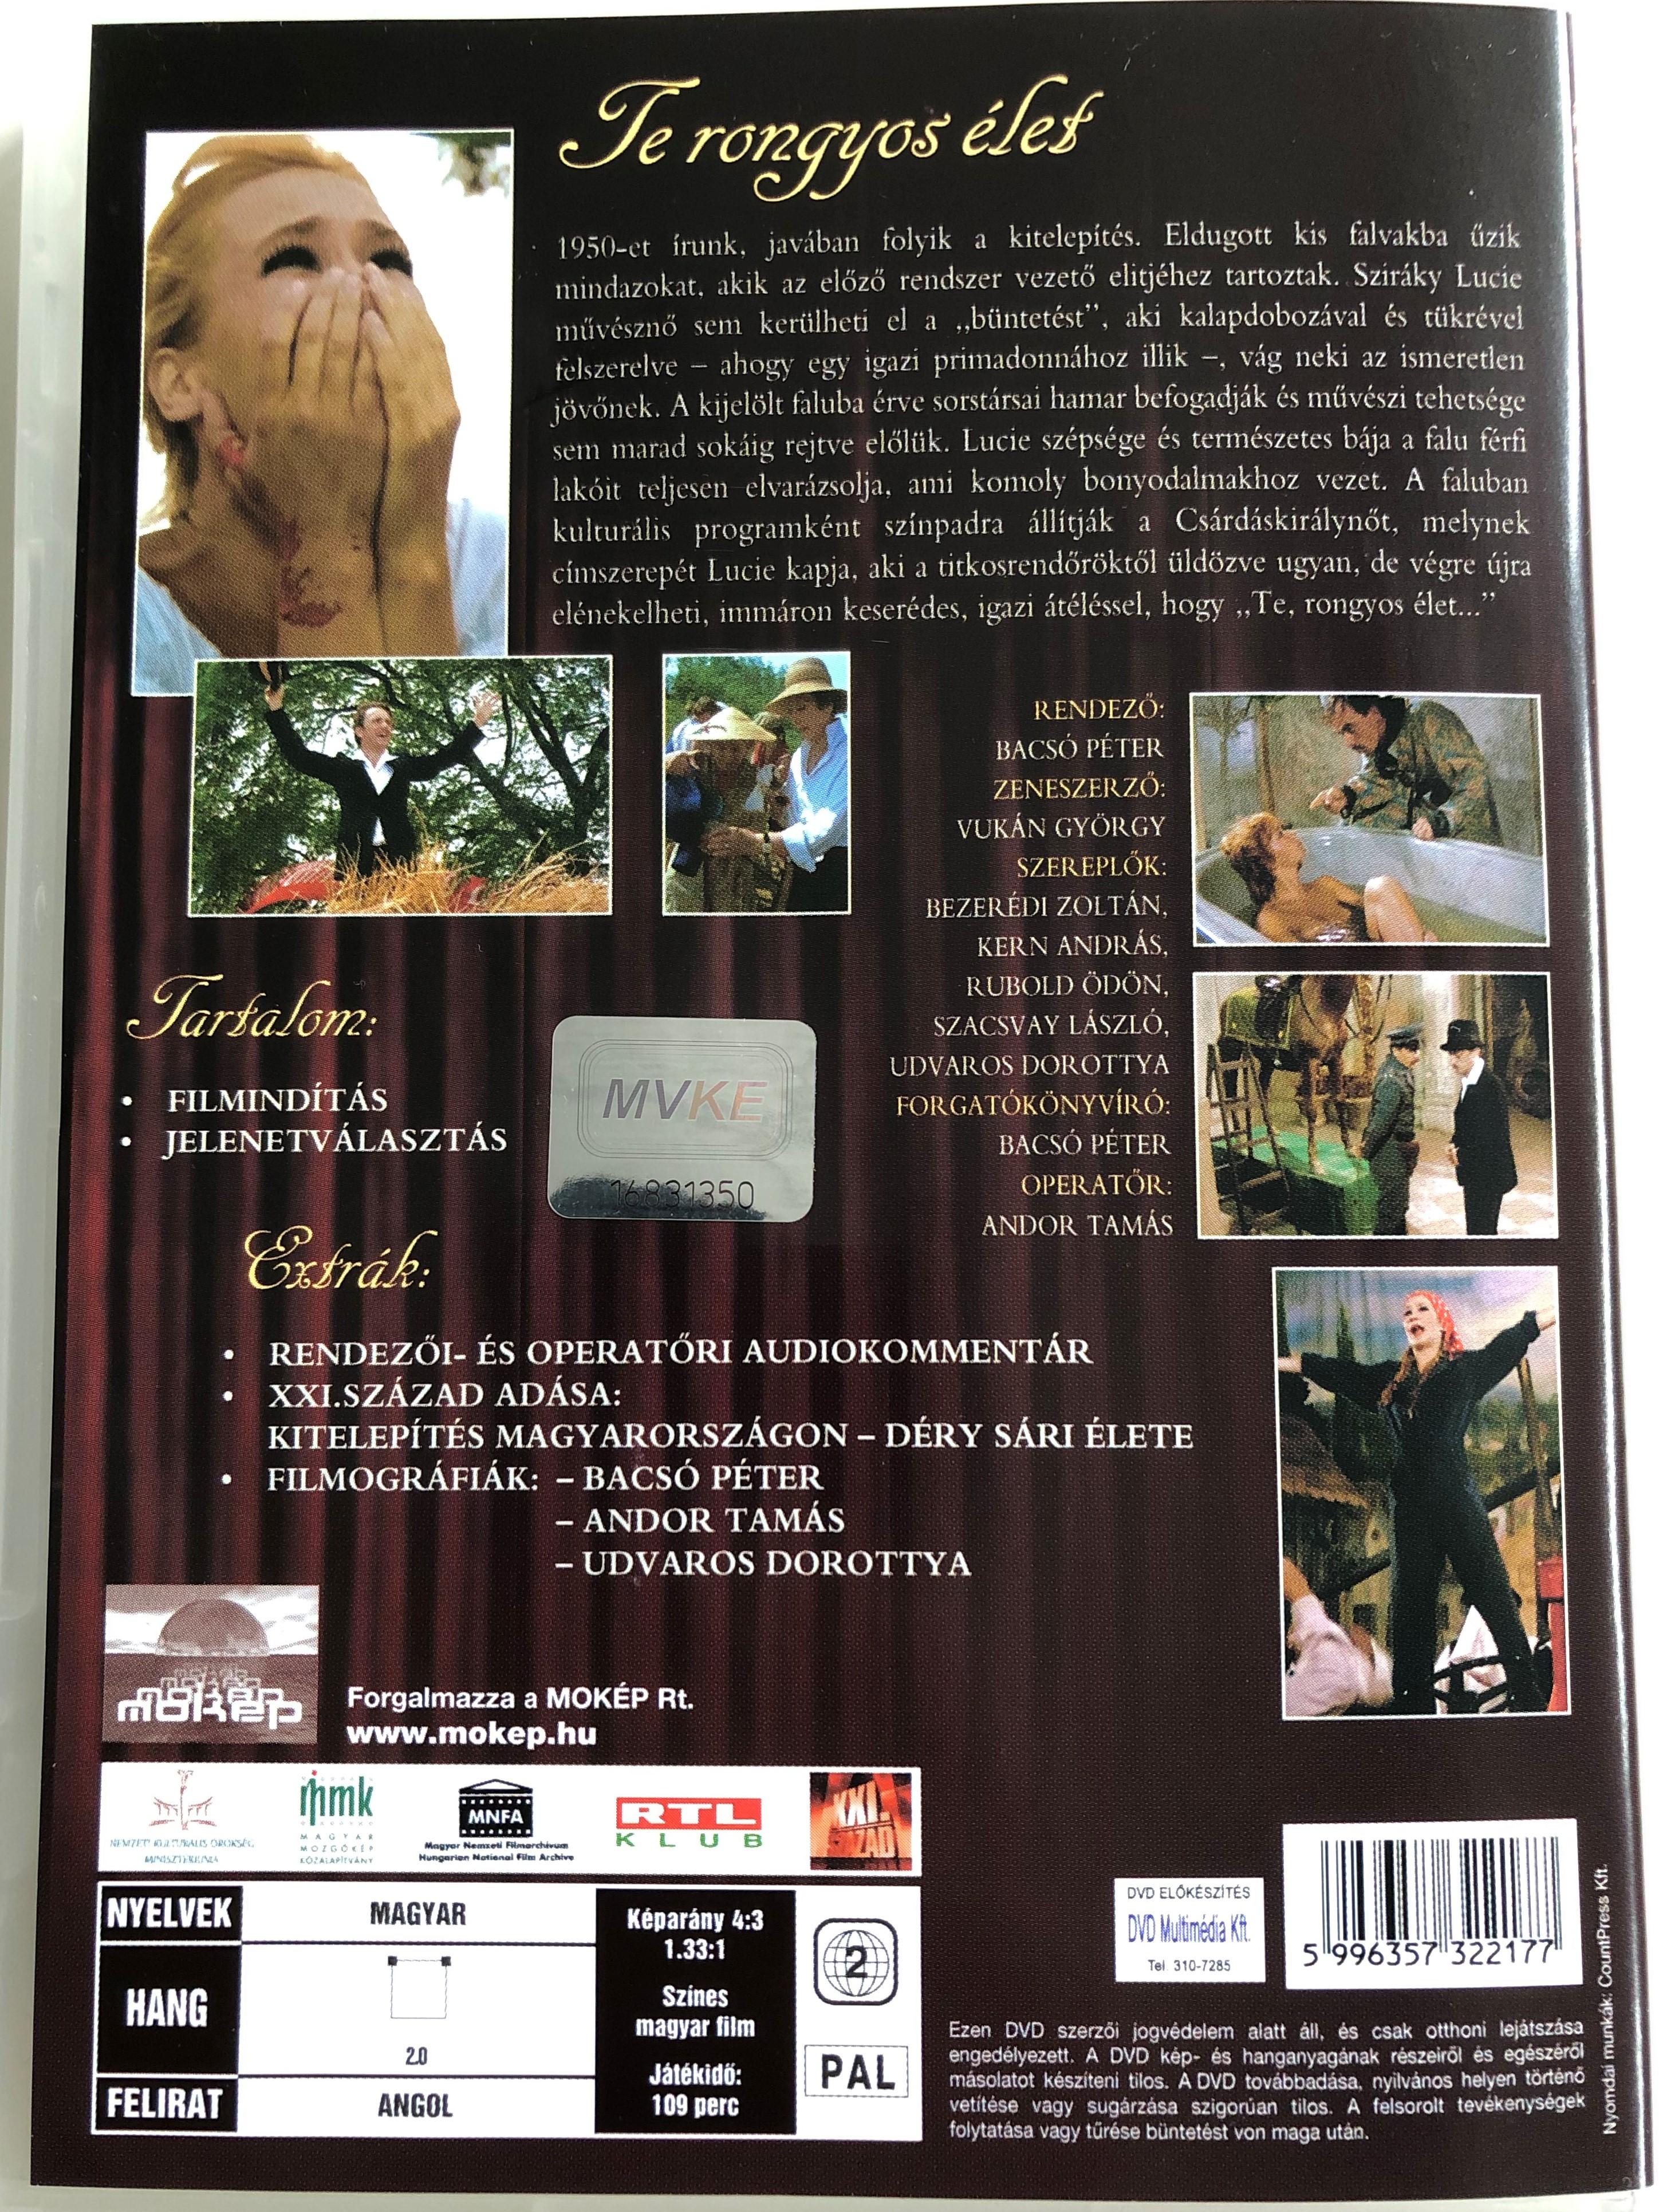 te-rongyos-let-dvd-directed-by-bacs-p-ter-2.jpg